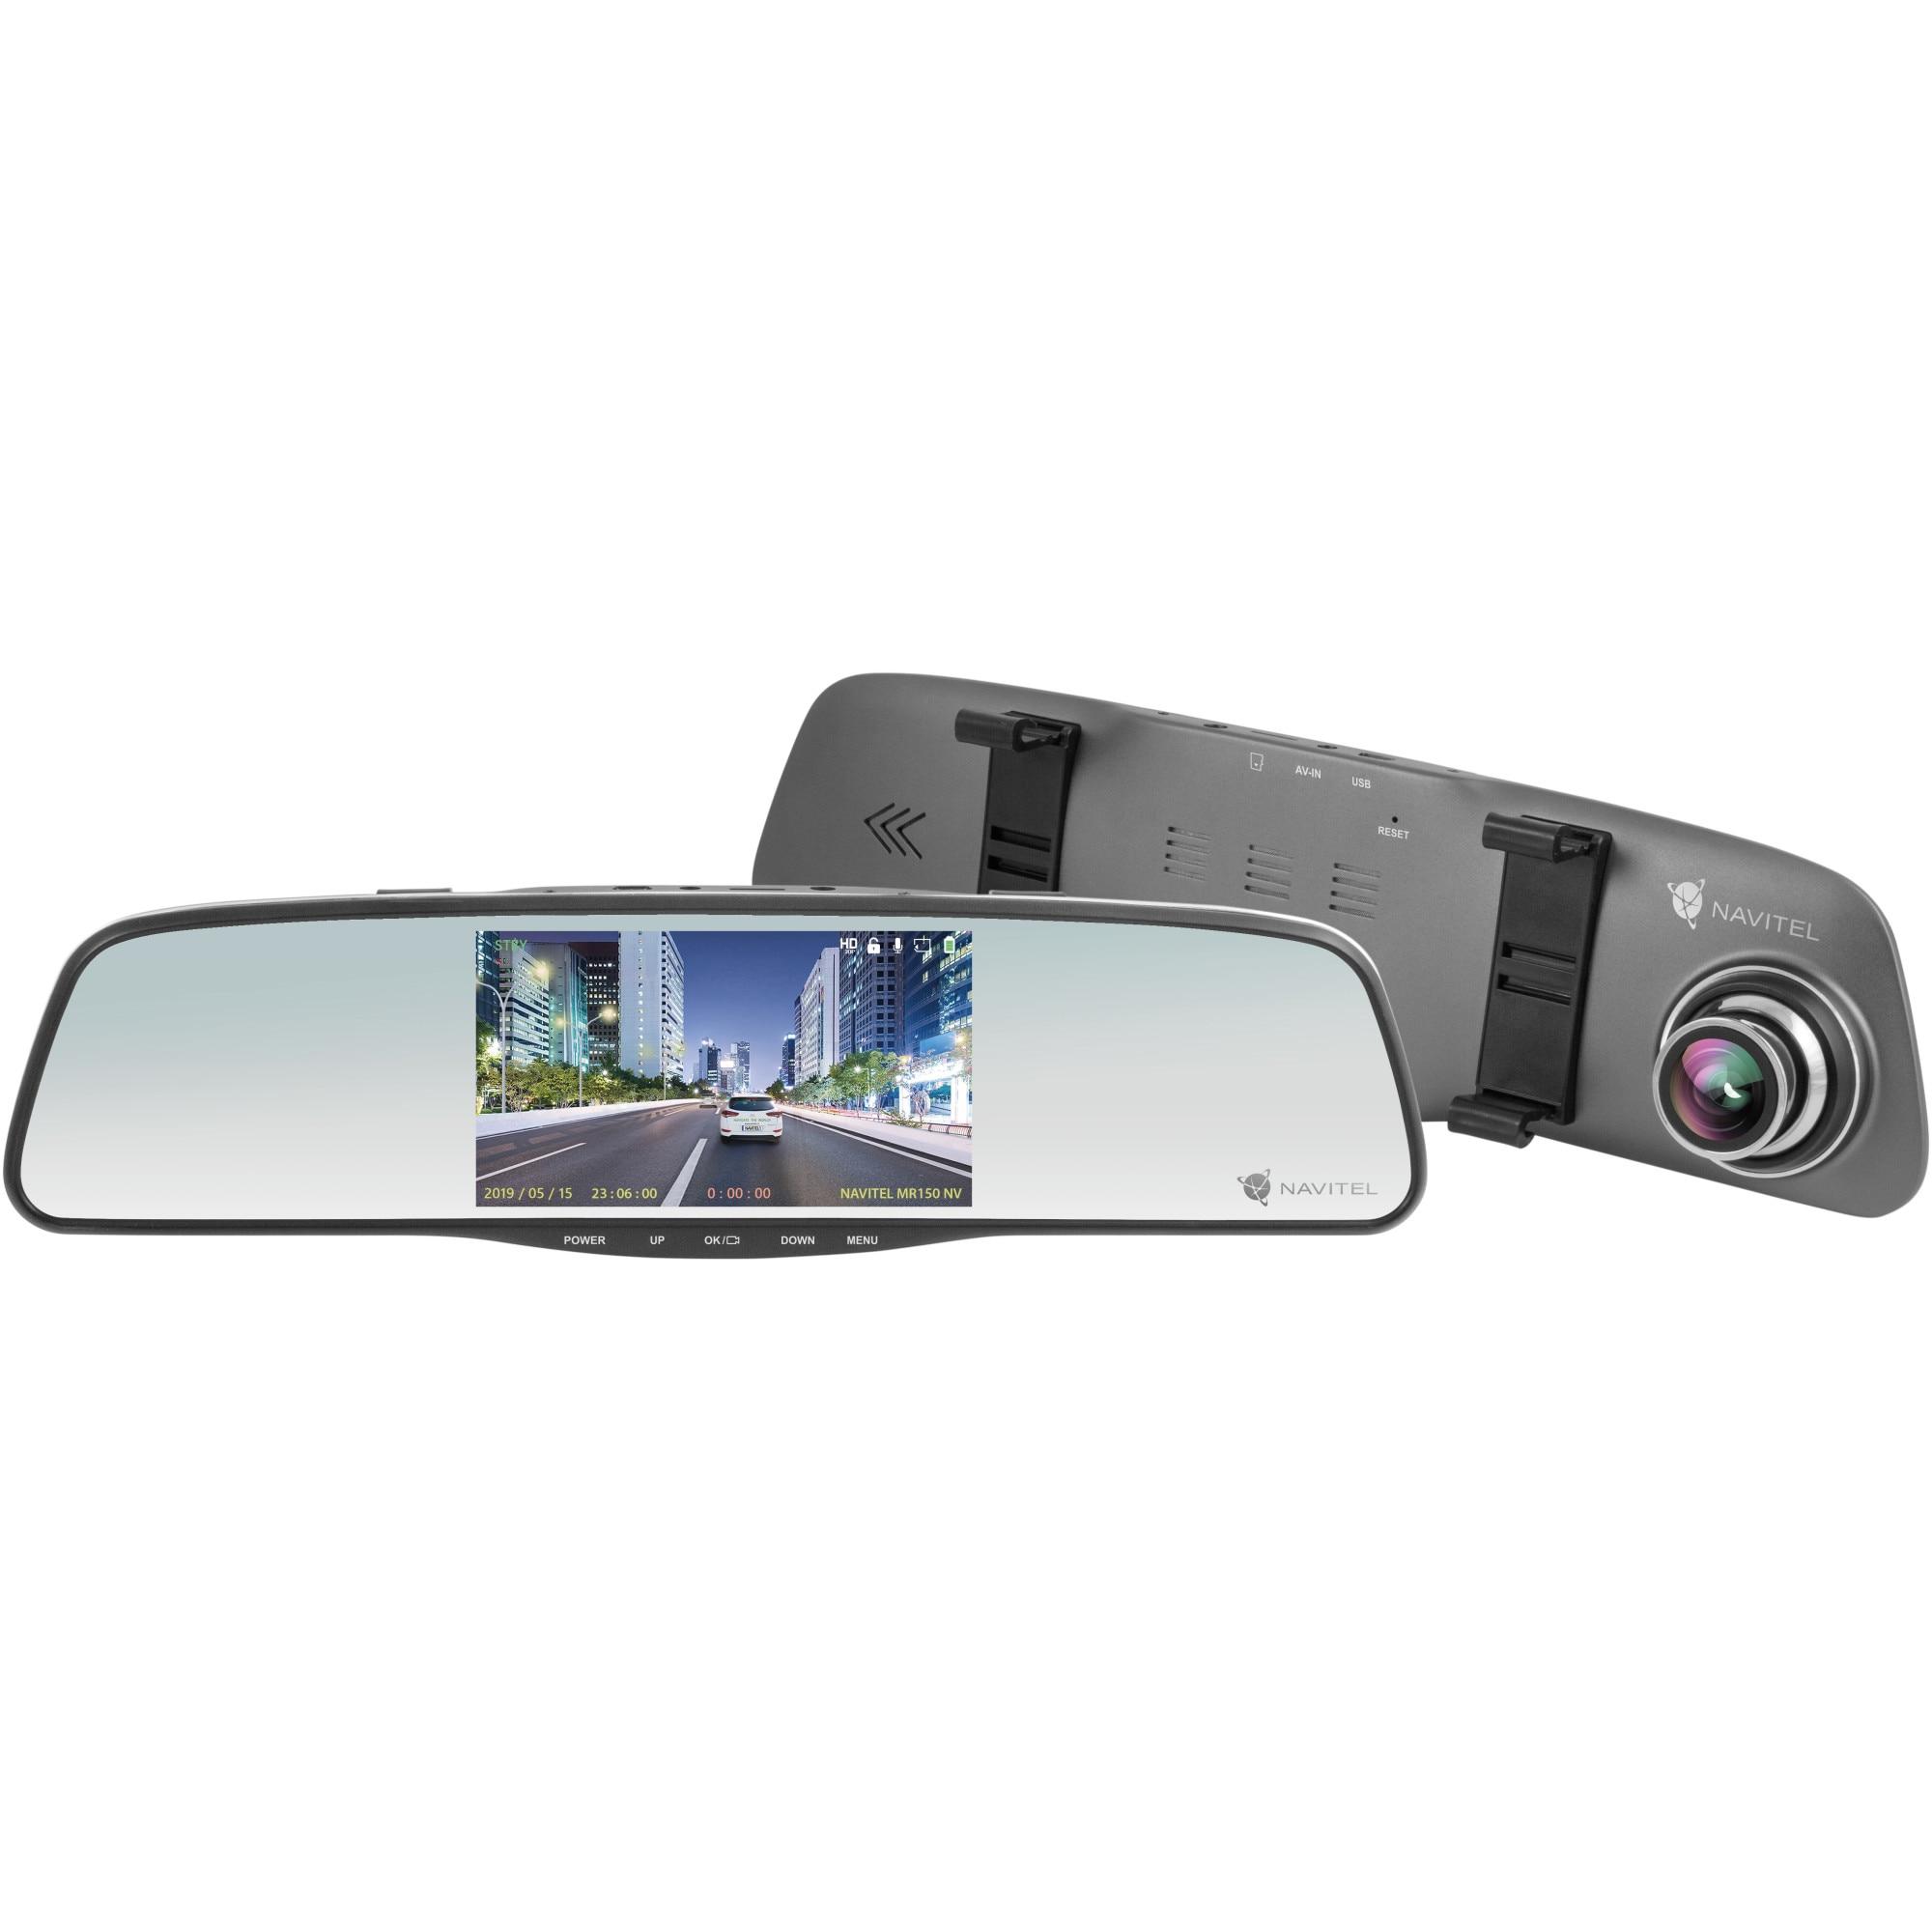 "Fotografie Camera Auto DVR Navitel MR150NV cu night vision, FHD, fixare pe oglinda retovizoare, ecran 5"", G-Sensor"